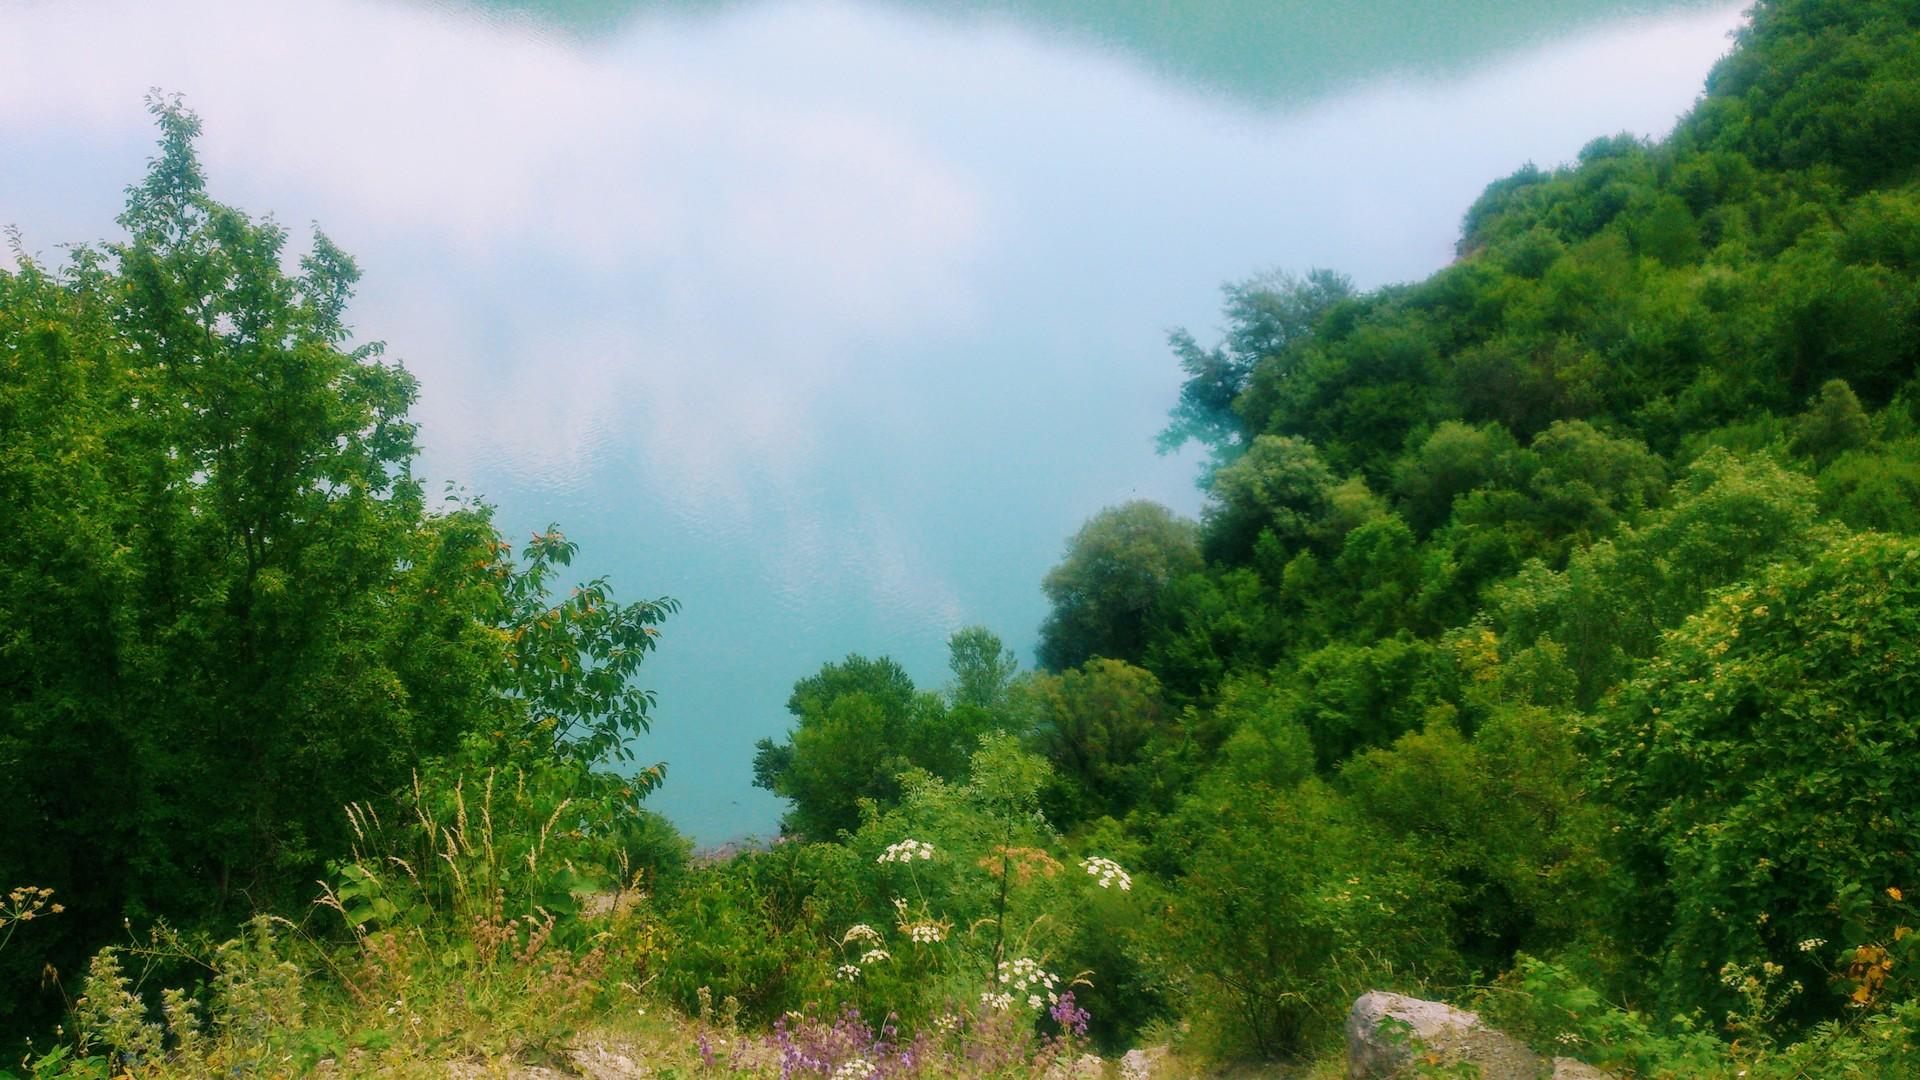 our-trip-kazbegi-_-zhinvali-dam-040a6f56